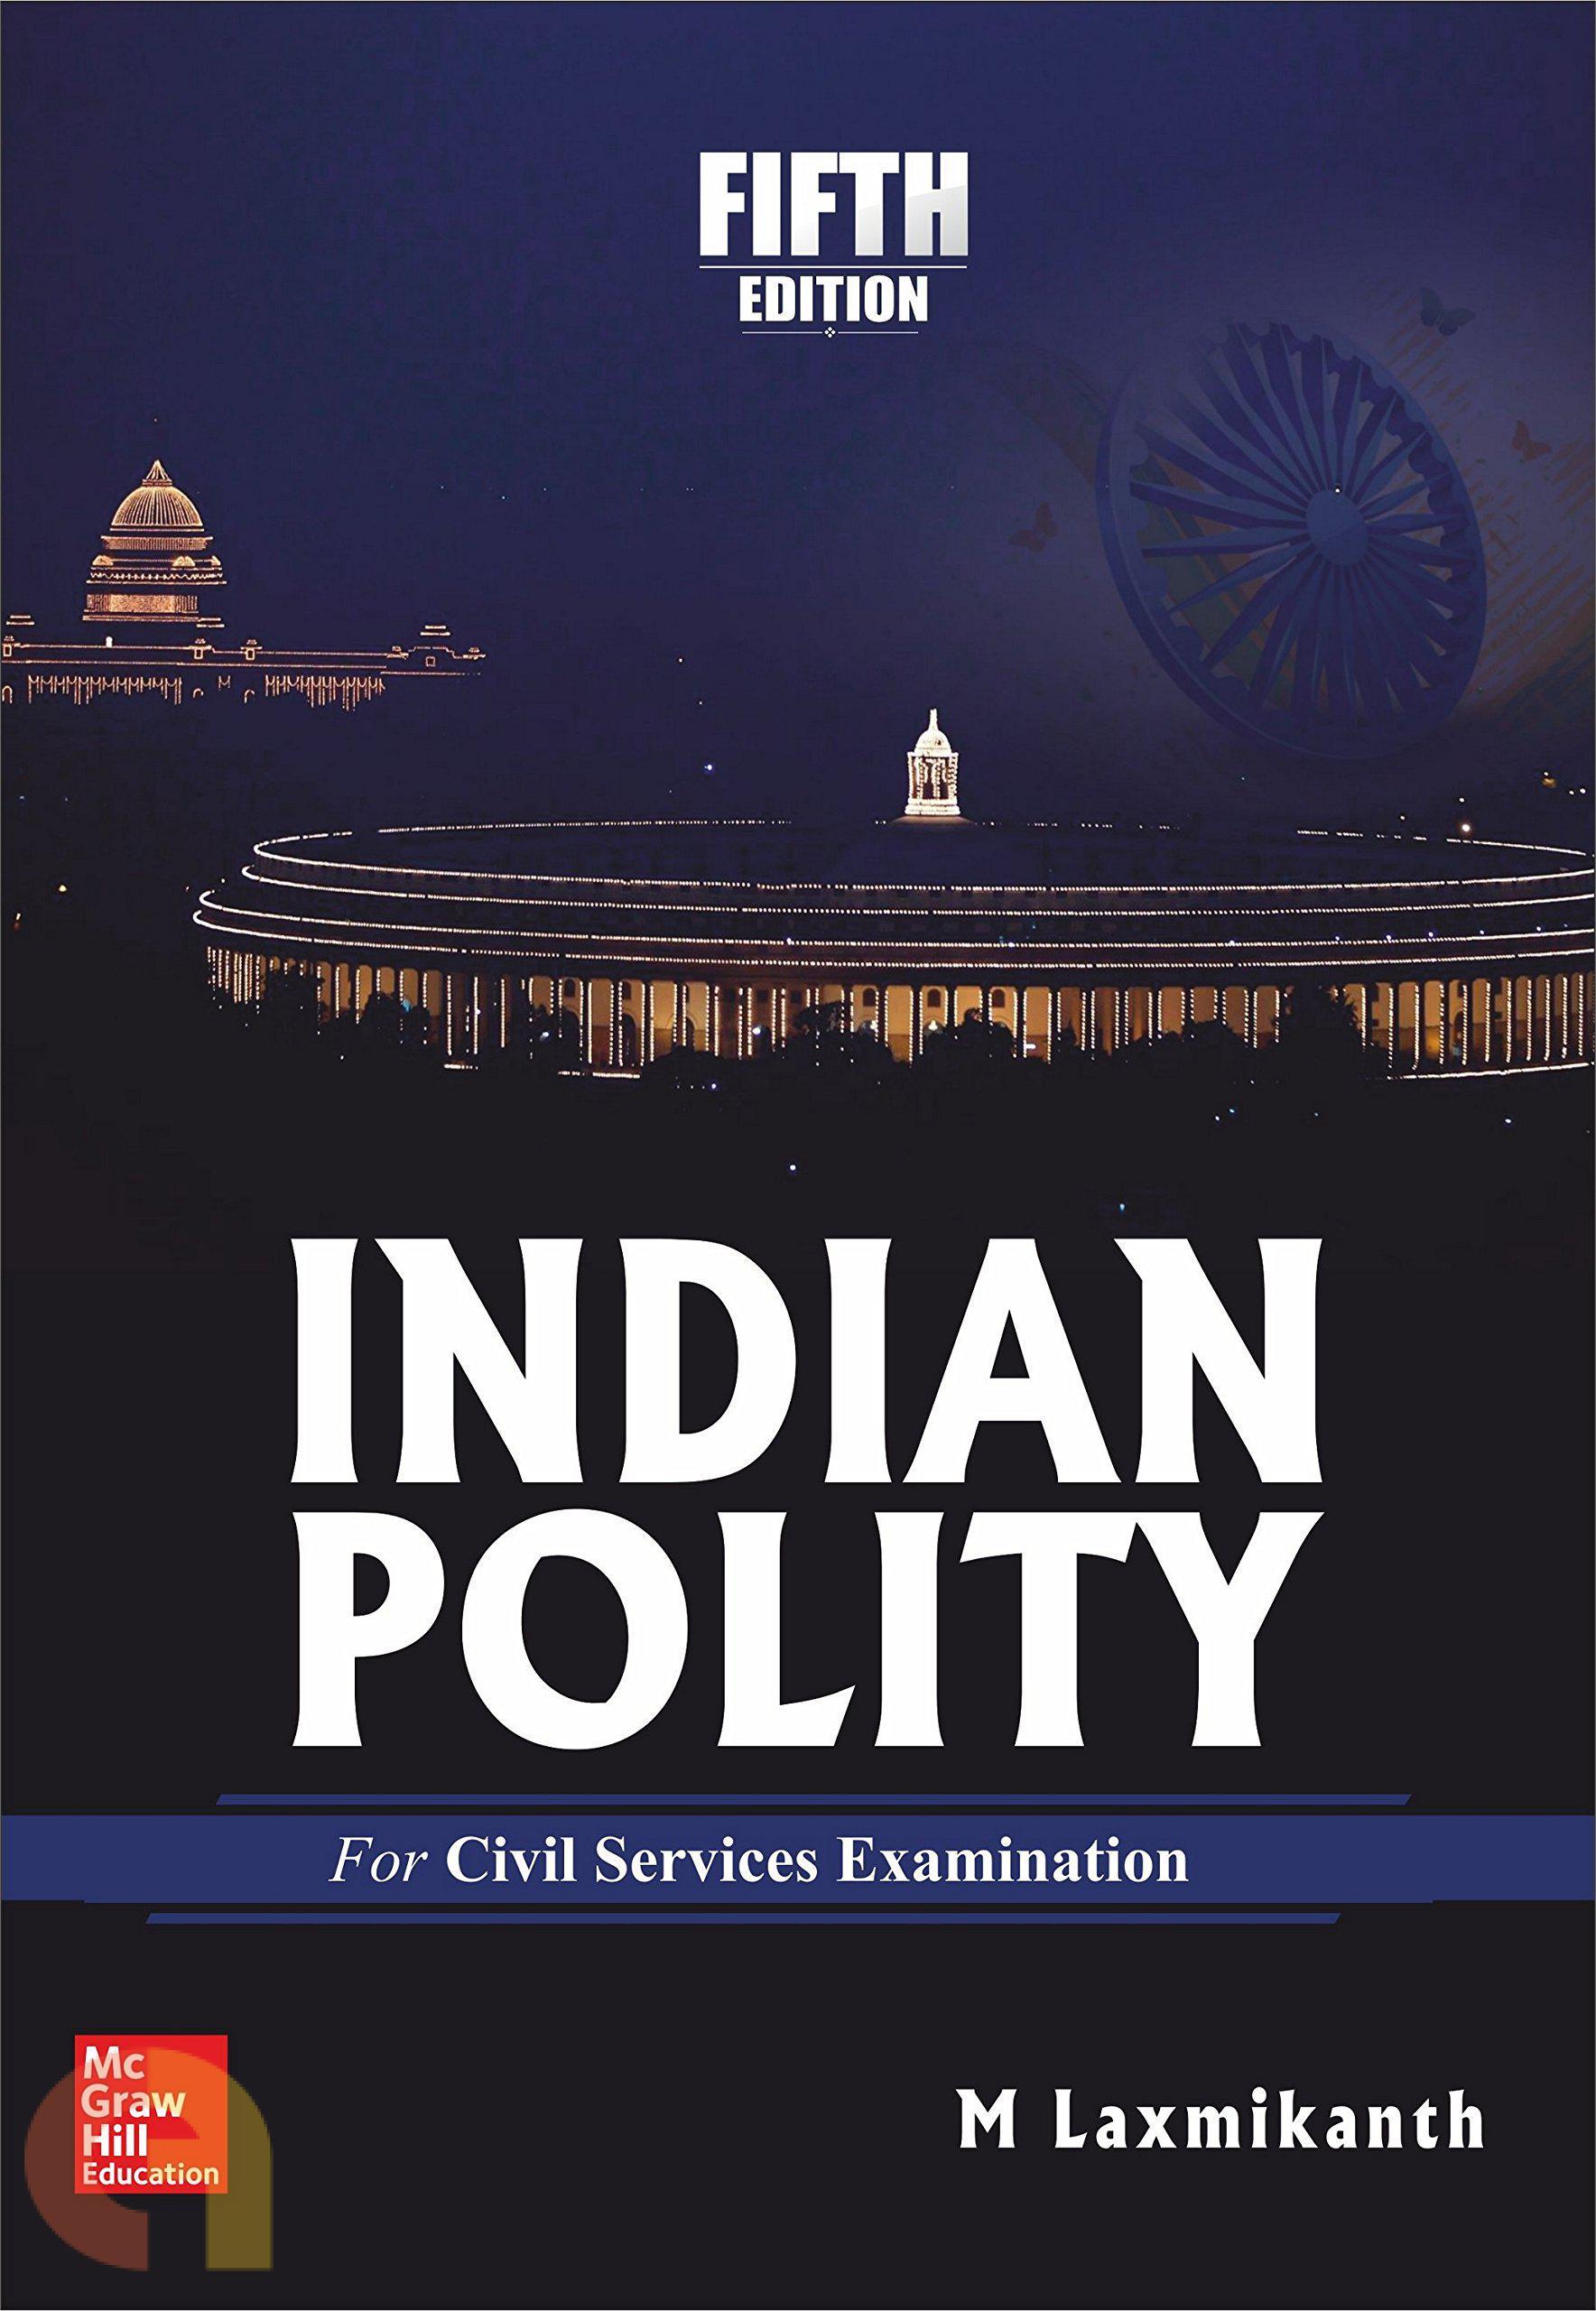 Indian Polity (5e)